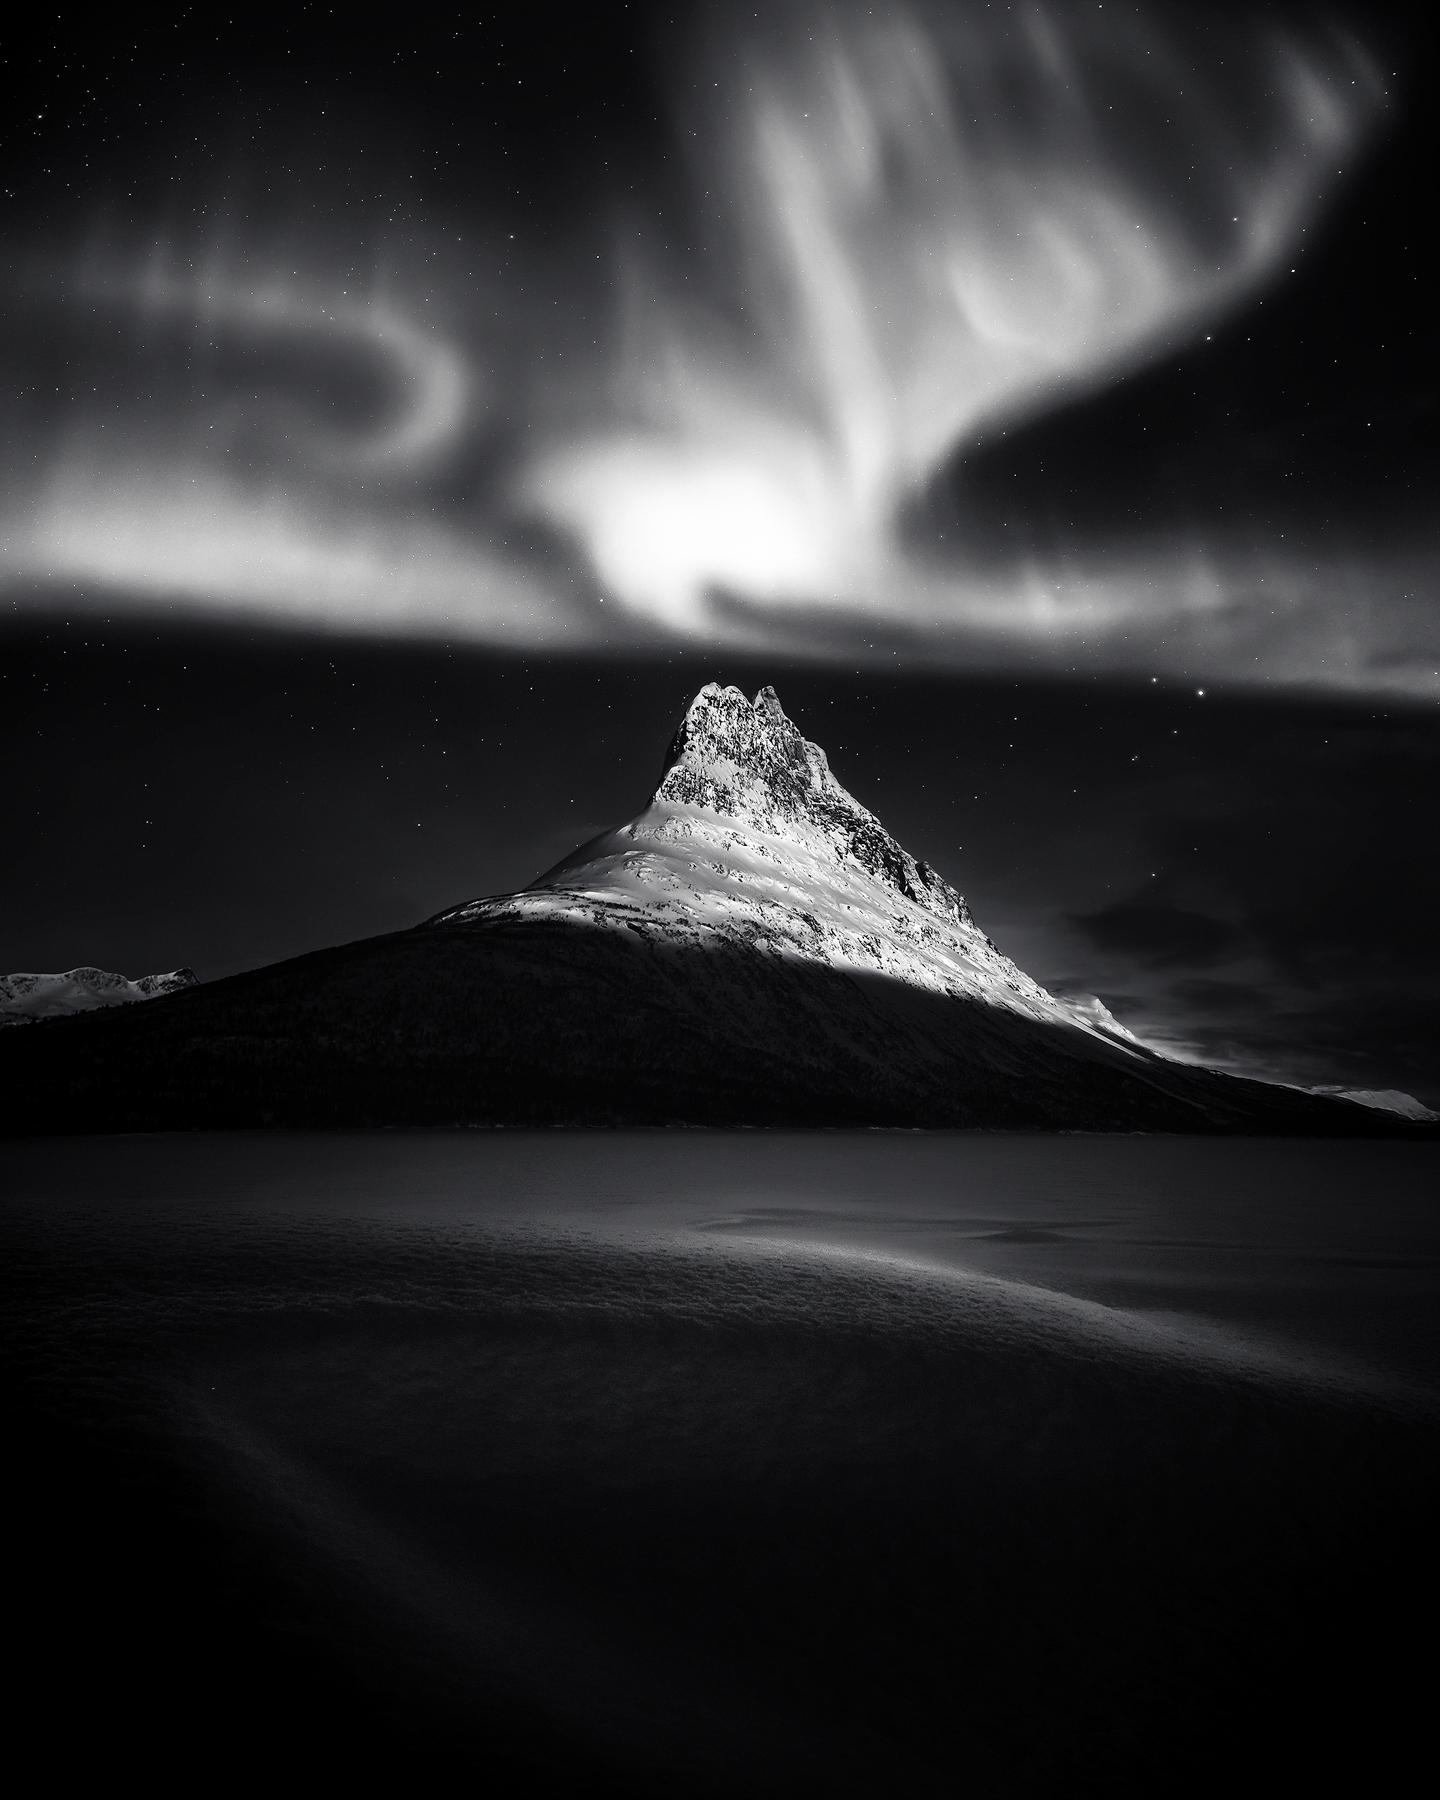 © Daniel Laan